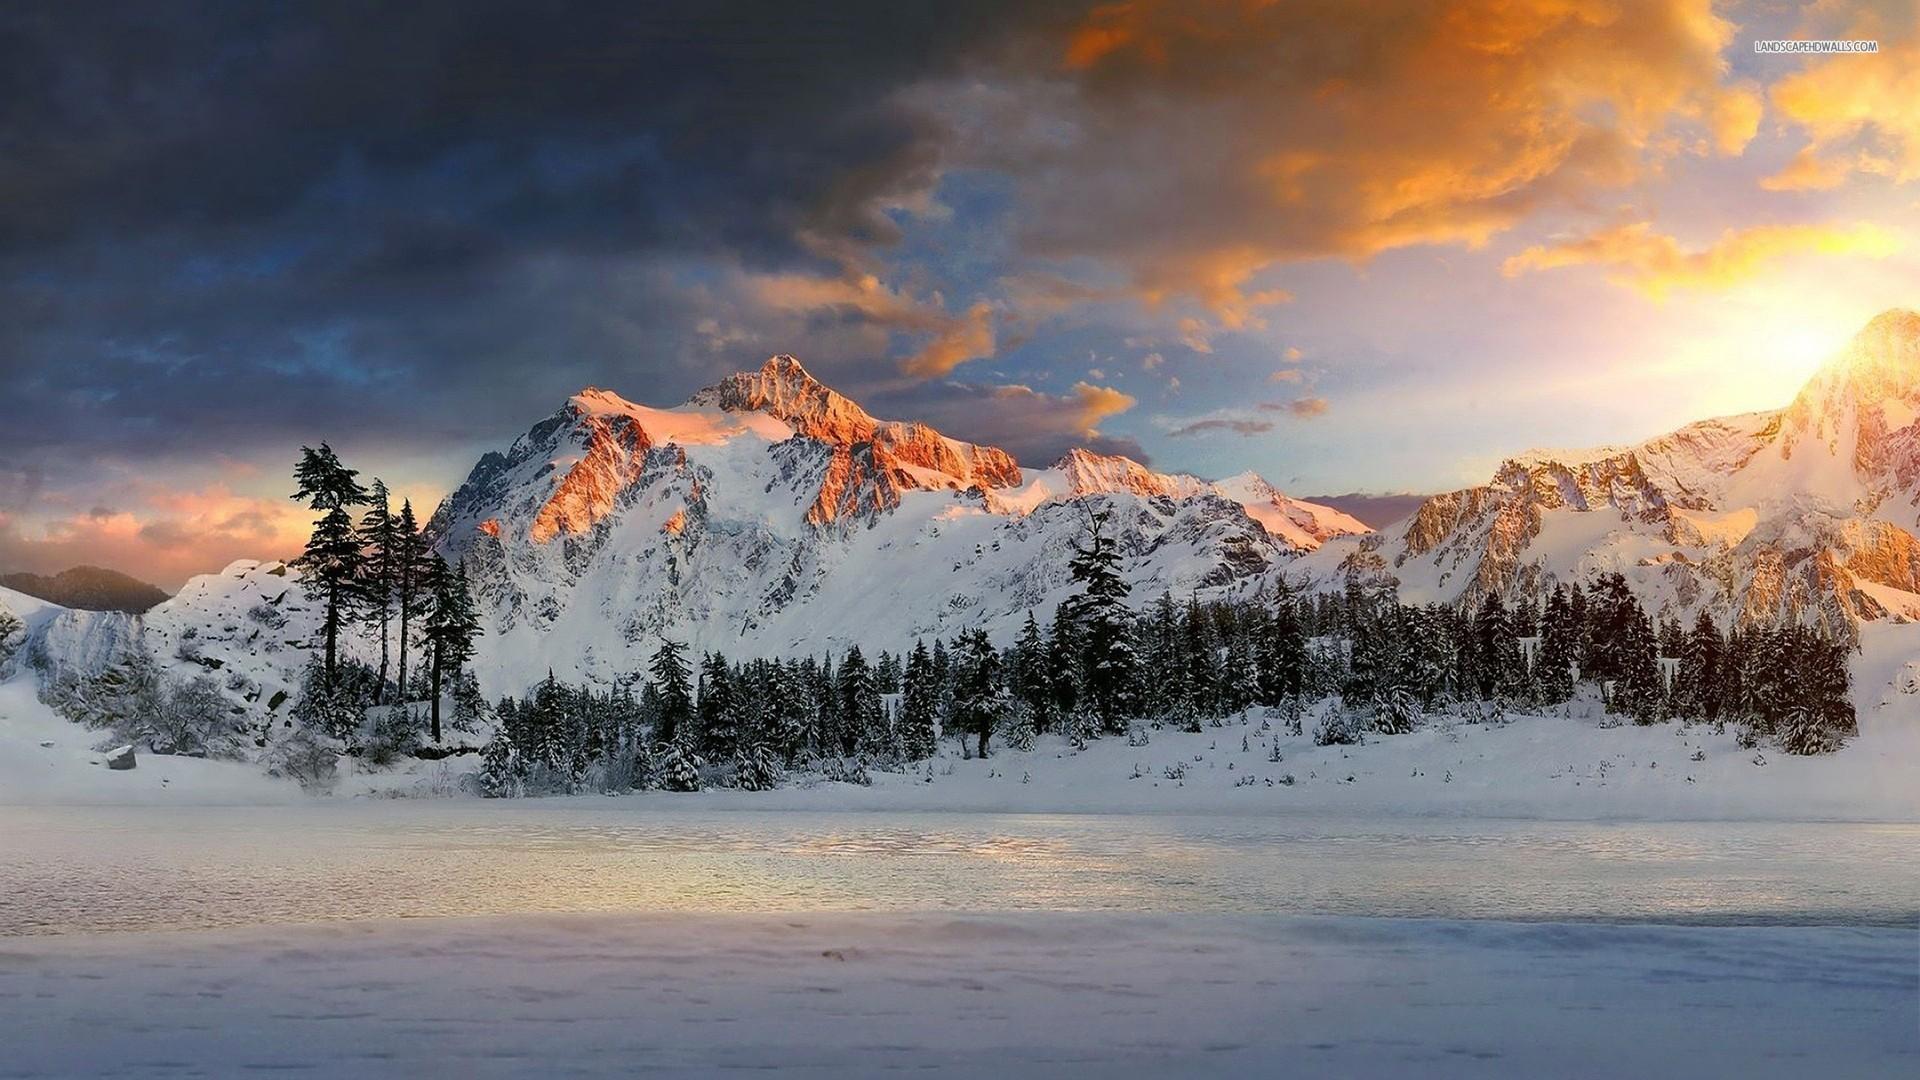 Snow Mountains Sunset Wallpaper Snowy mountain field